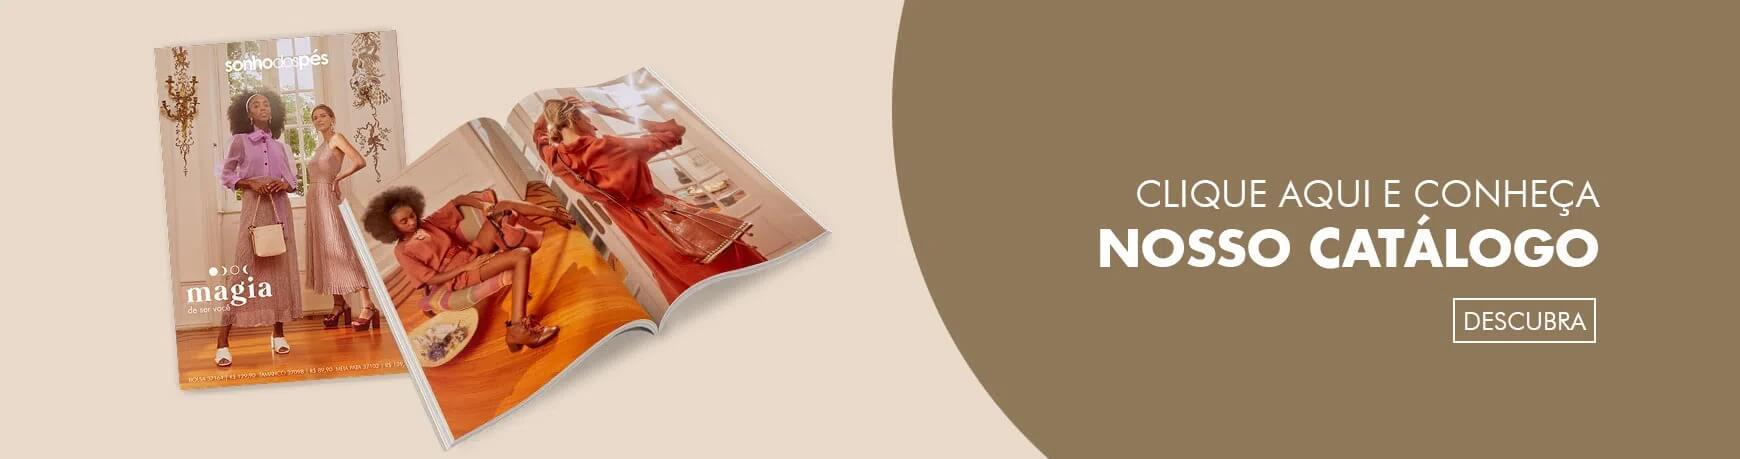 Lookbook - Catálogo Digital